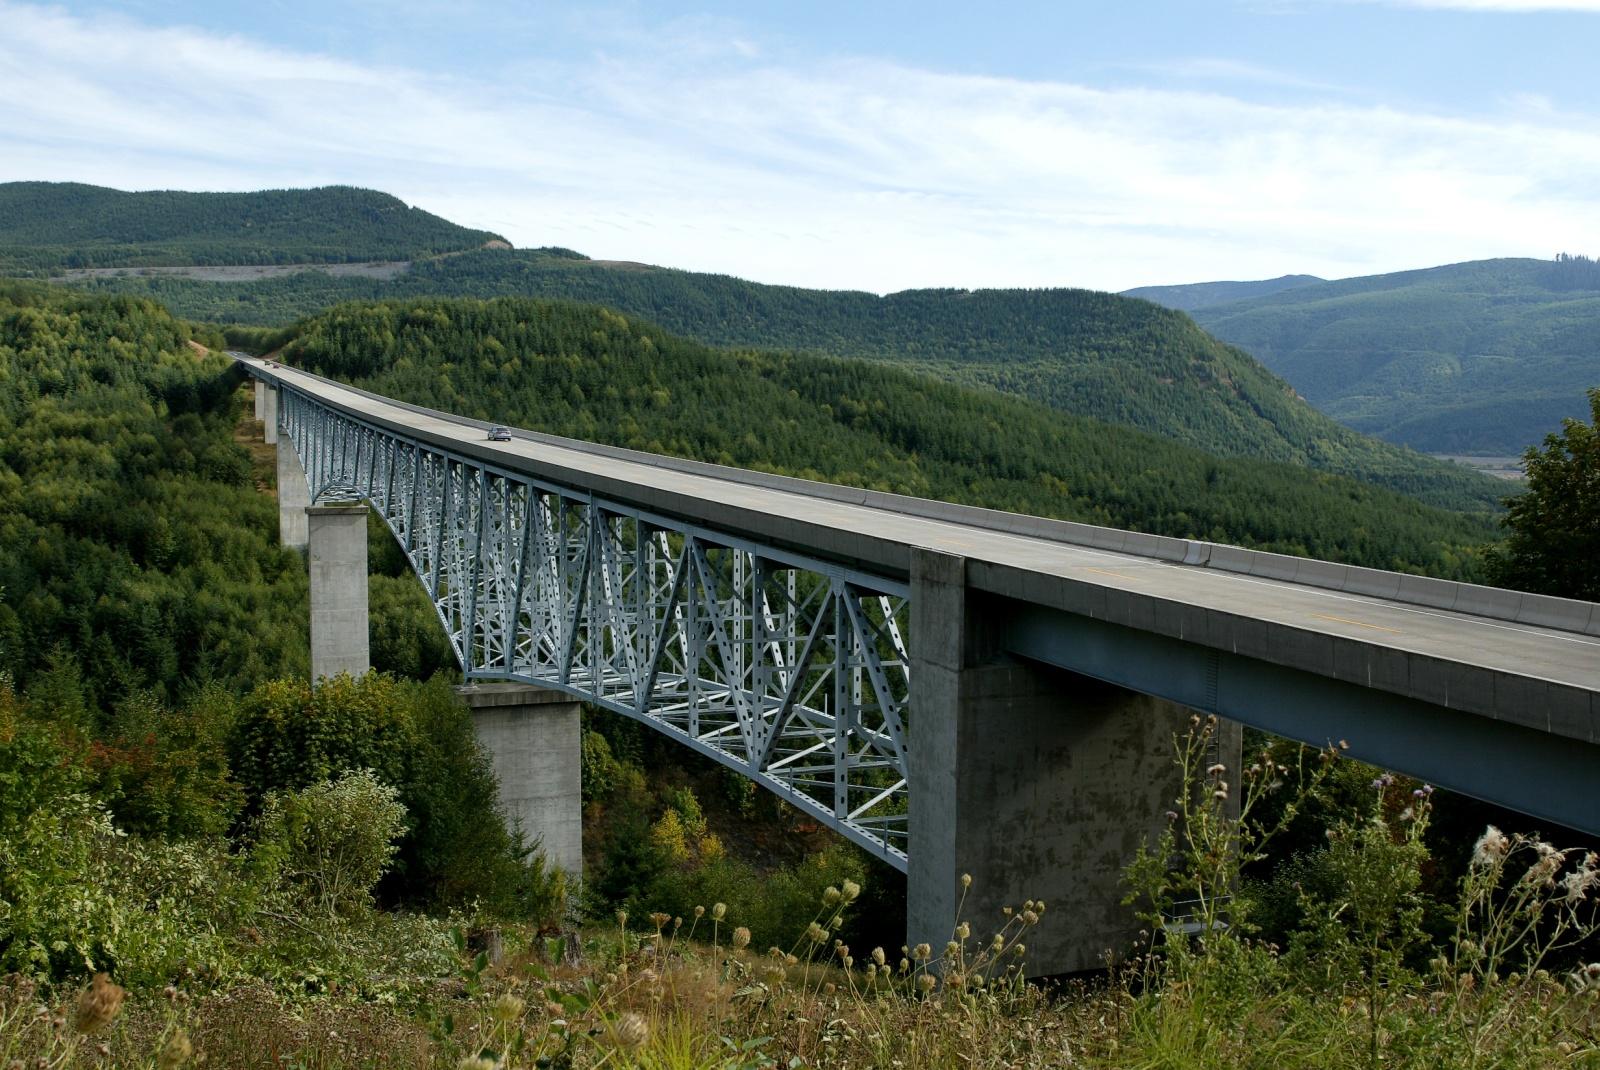 Bridge to Mt. St. Helens